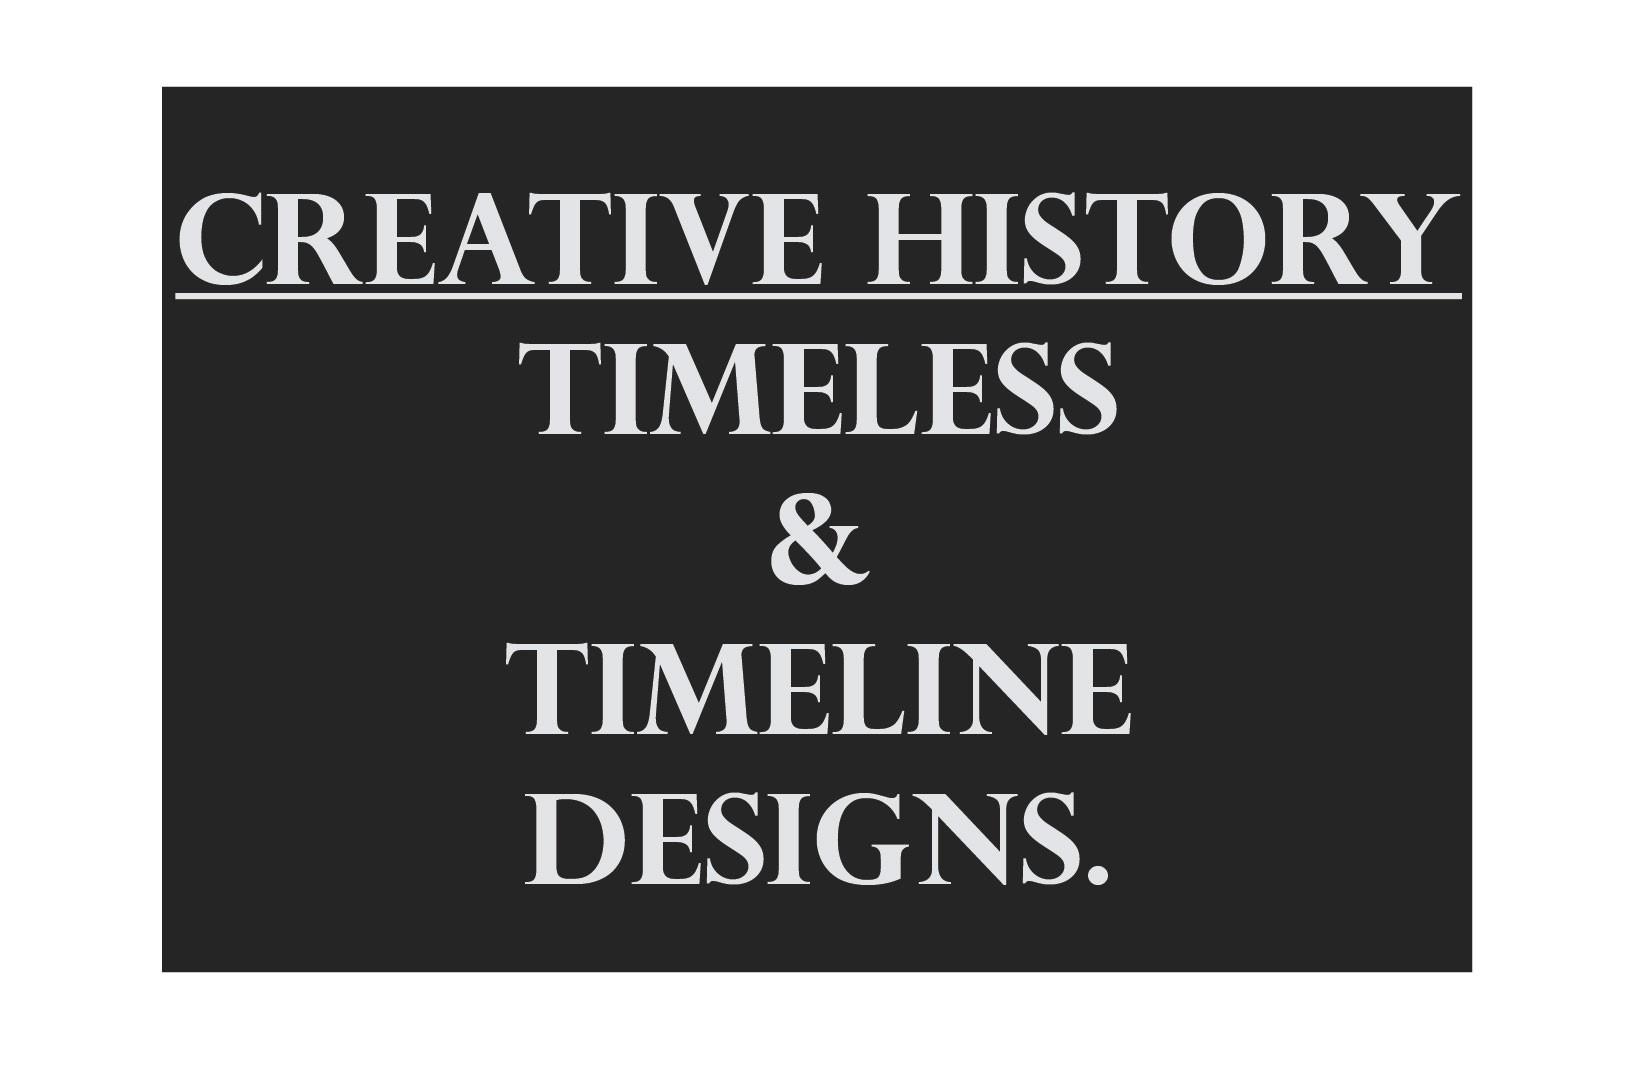 Poster design history - Poster Design Creative History Timeless Timeline